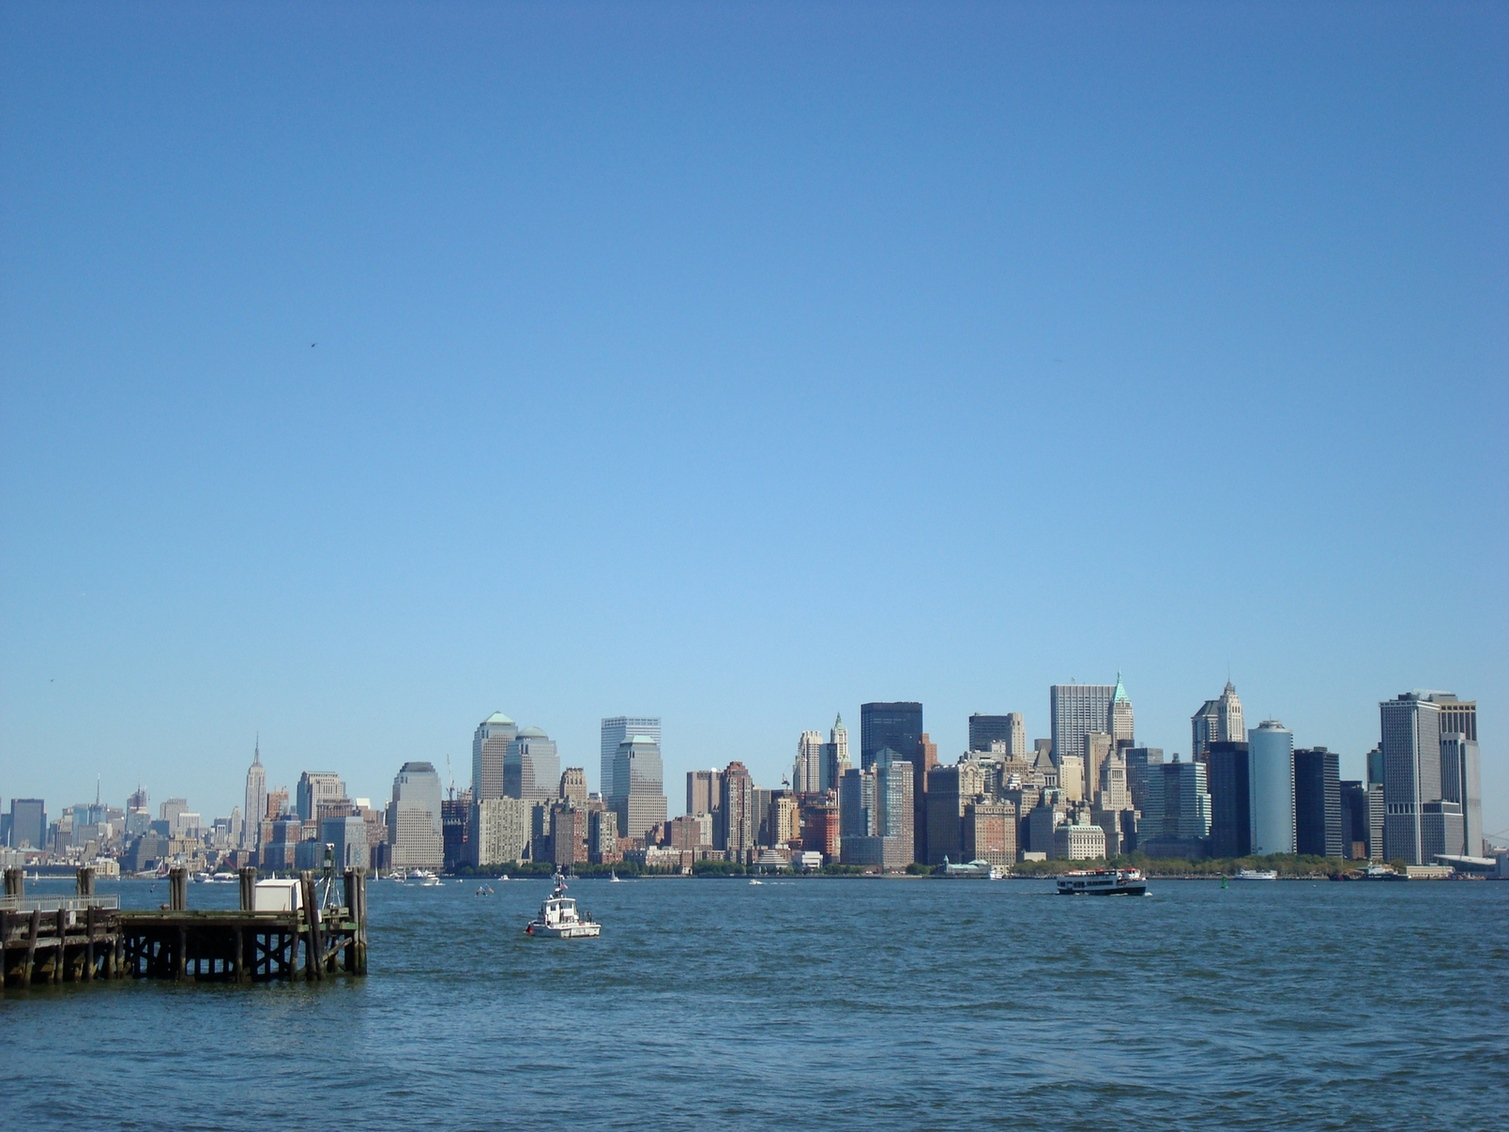 New York City_ManhattanSkyline_StatueofLiberty_Distance